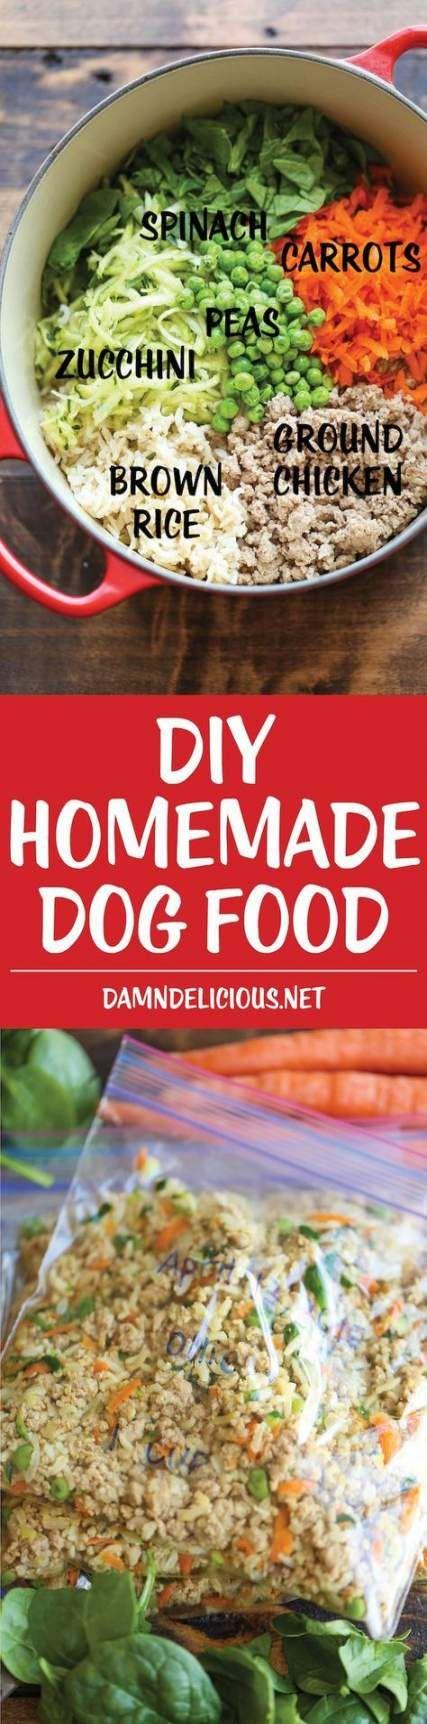 Diy Food Recipes Fitness 54+ Ideas #food #diy #fitness #recipes